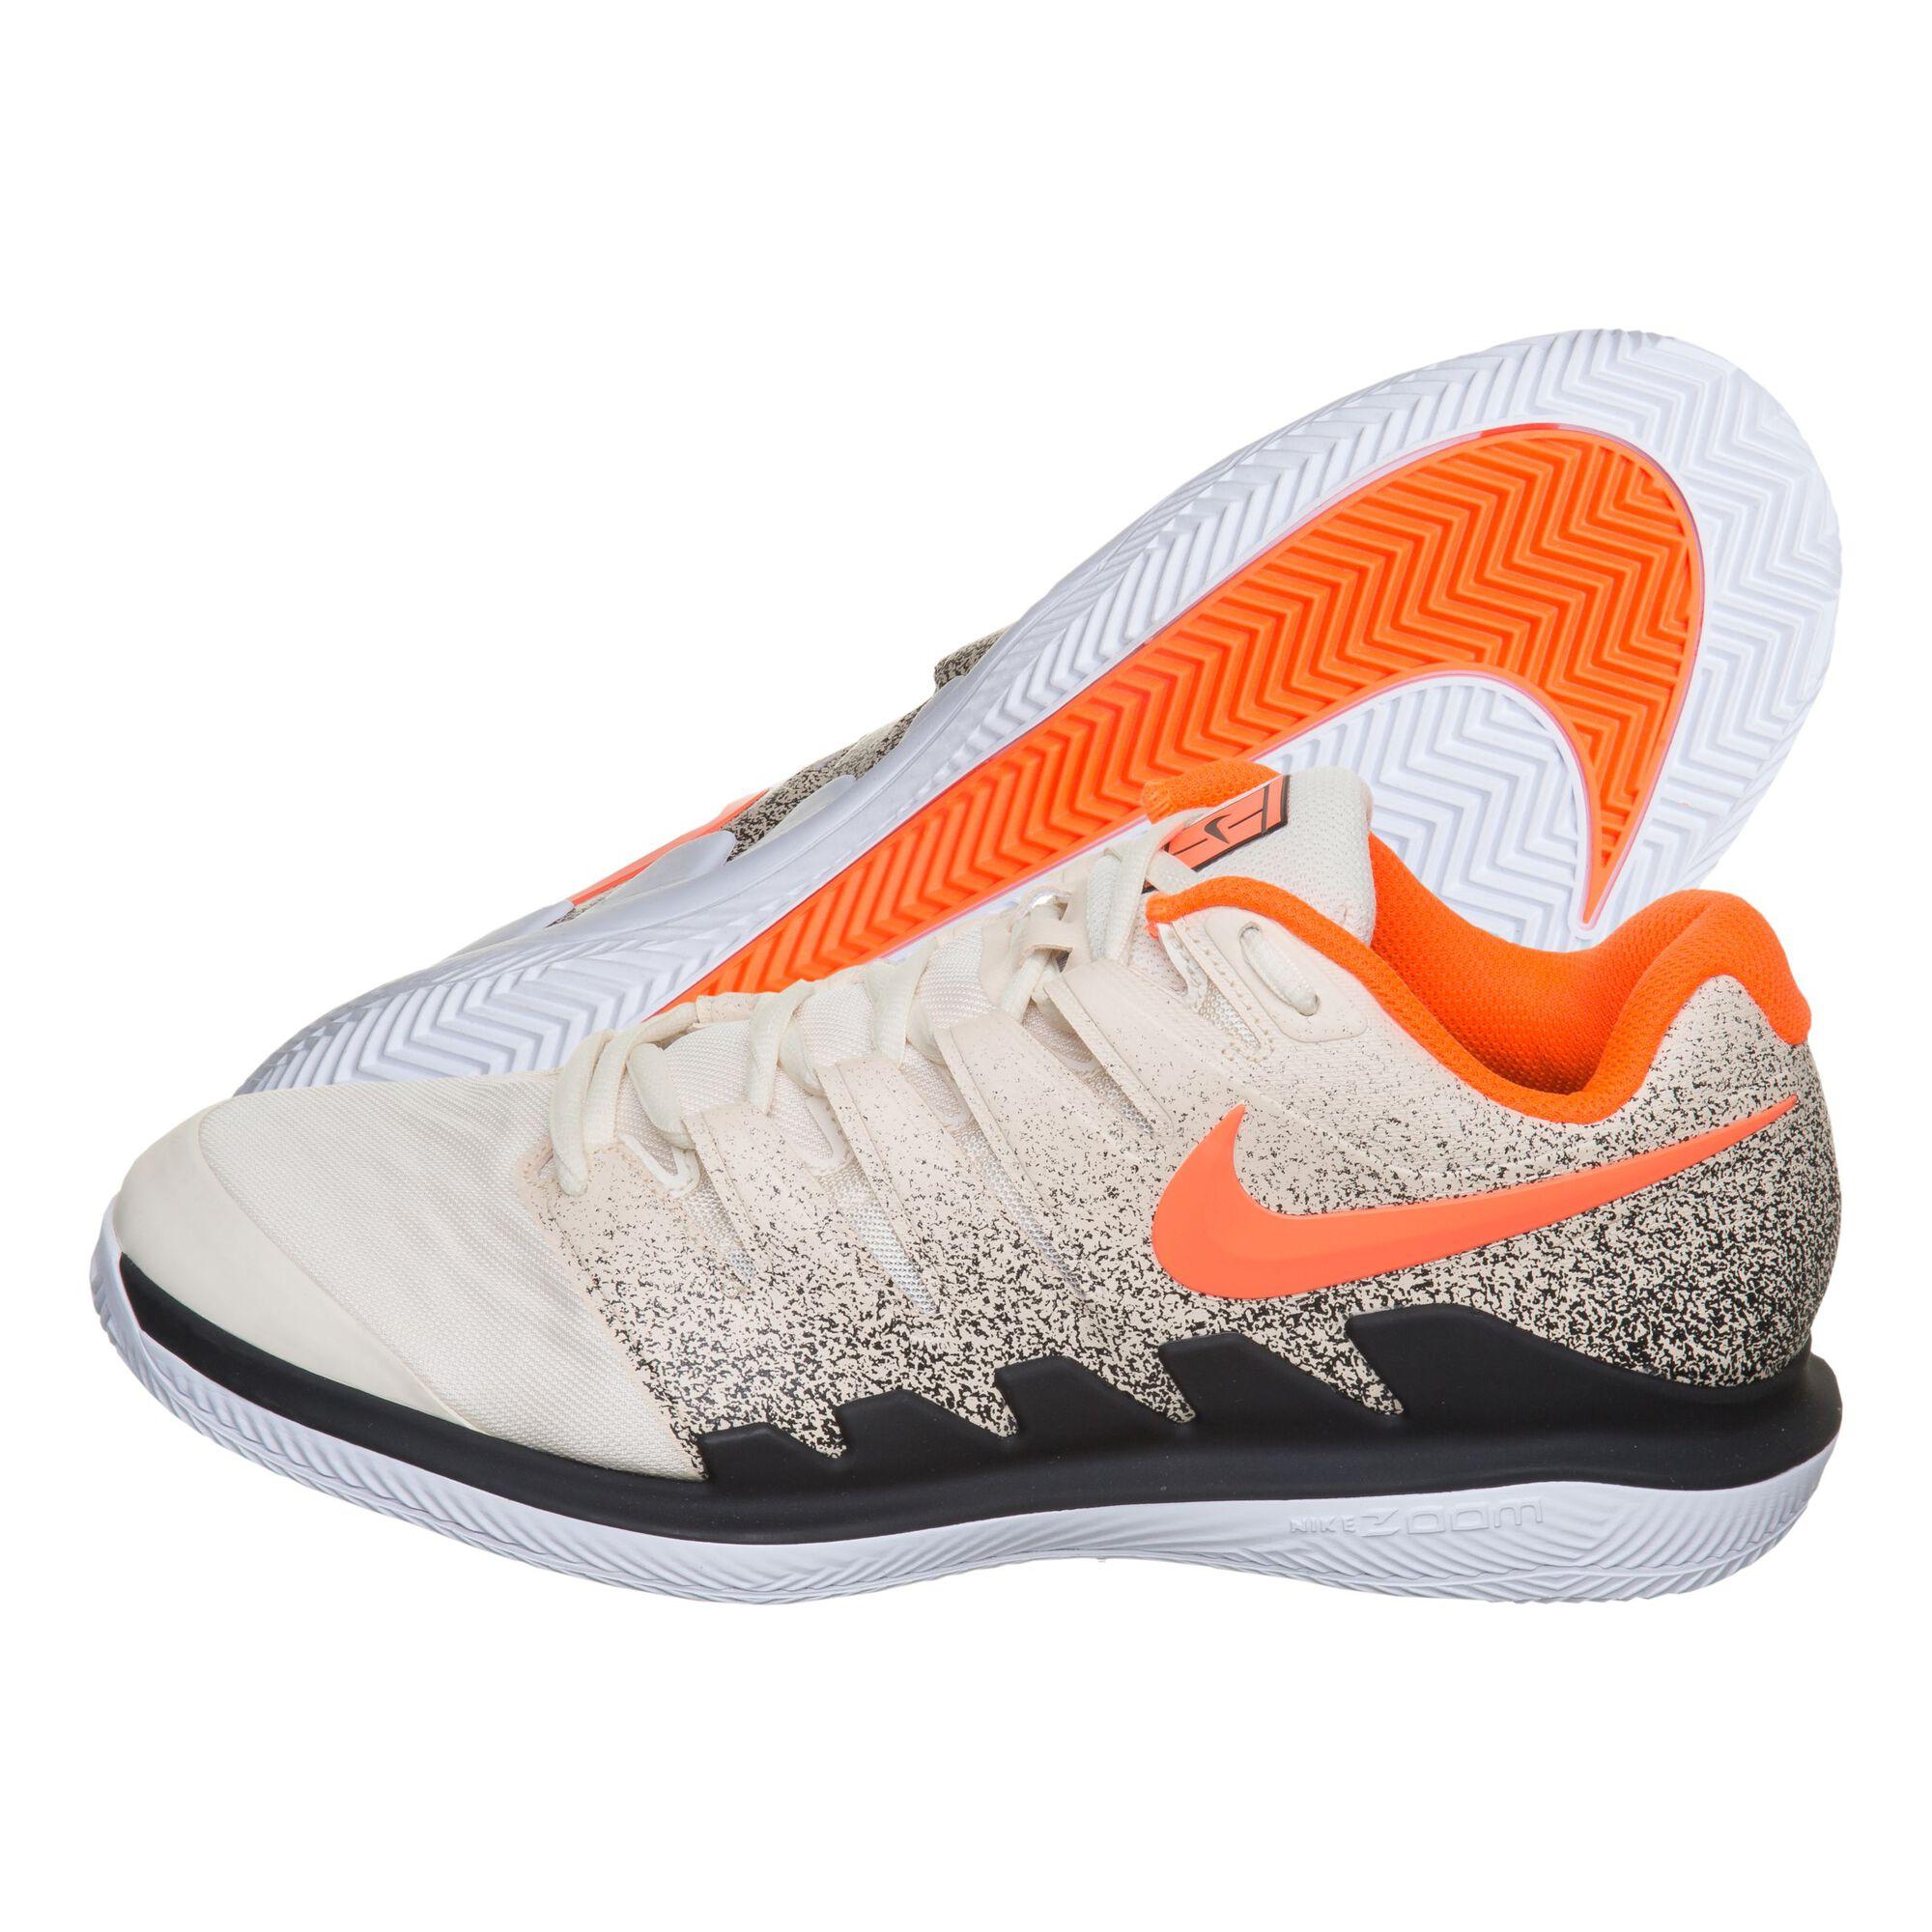 1e37f5c4440cd ... Nike  Nike  Nike  Nike  Nike  Nike  Nike. Air Zoom Vapor X Clay ...